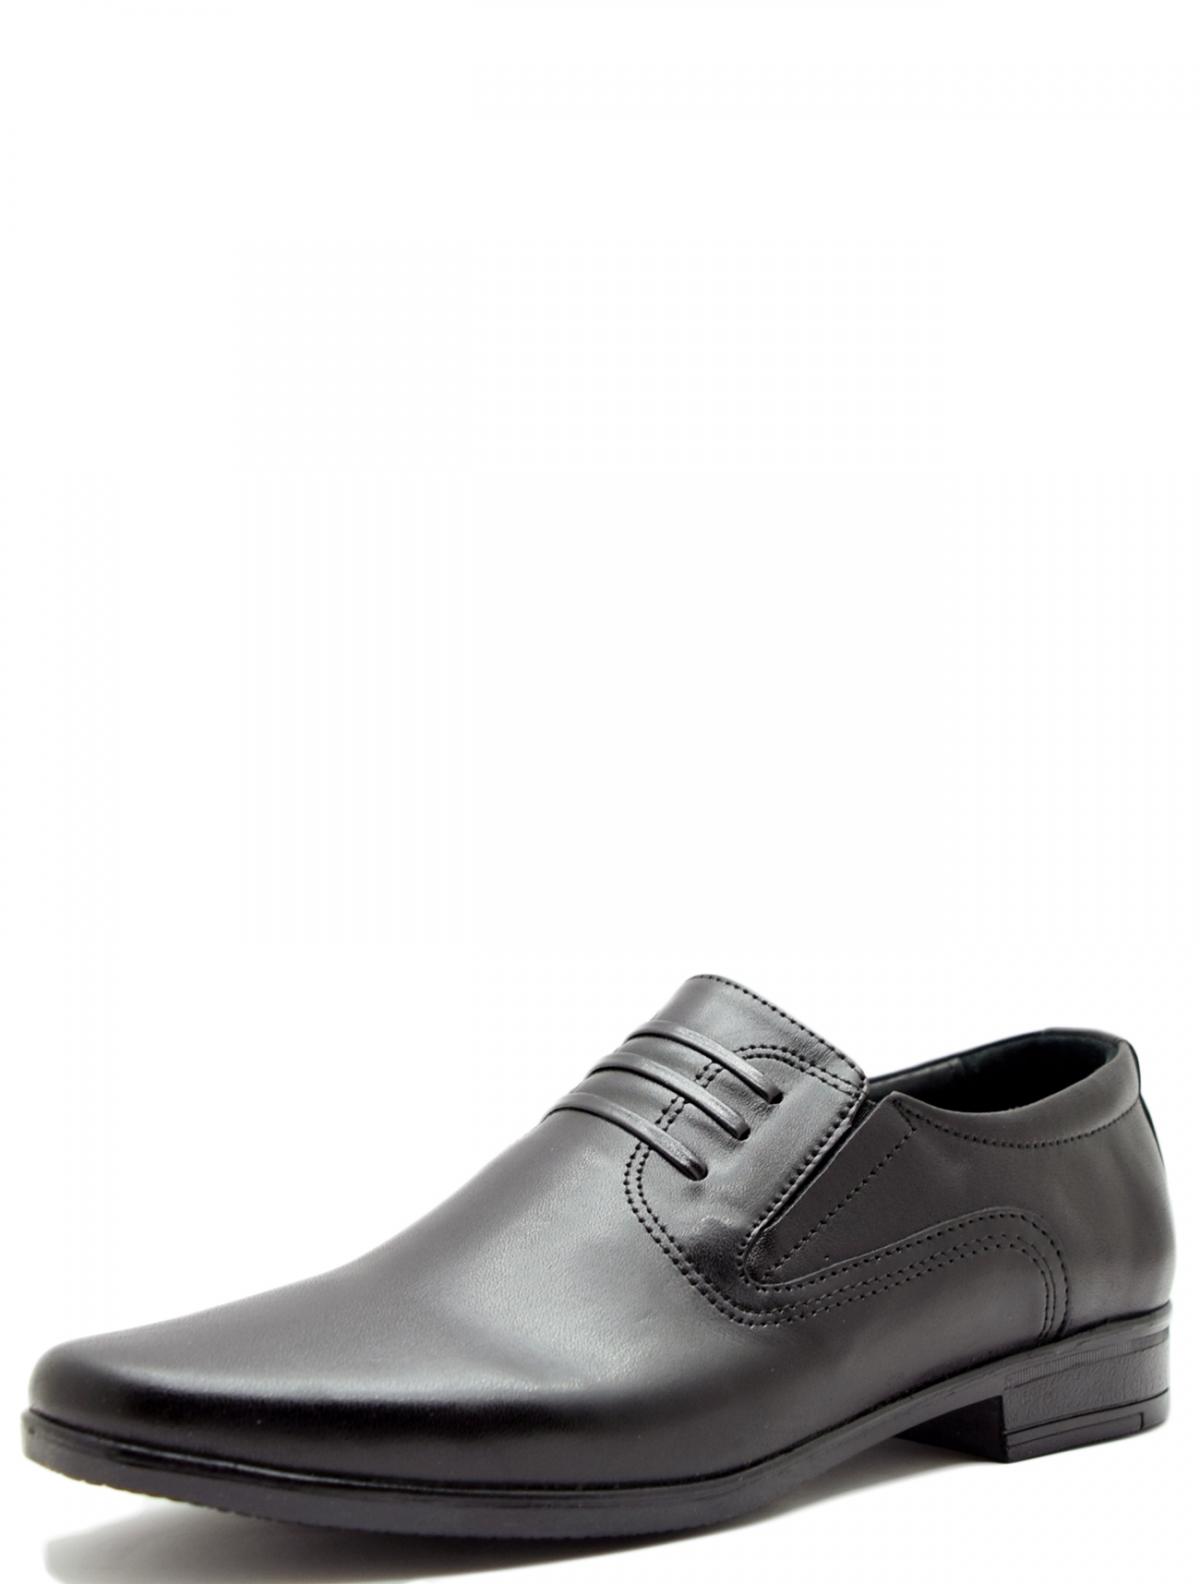 Rooman 802-017-V1 туфли для мальчика